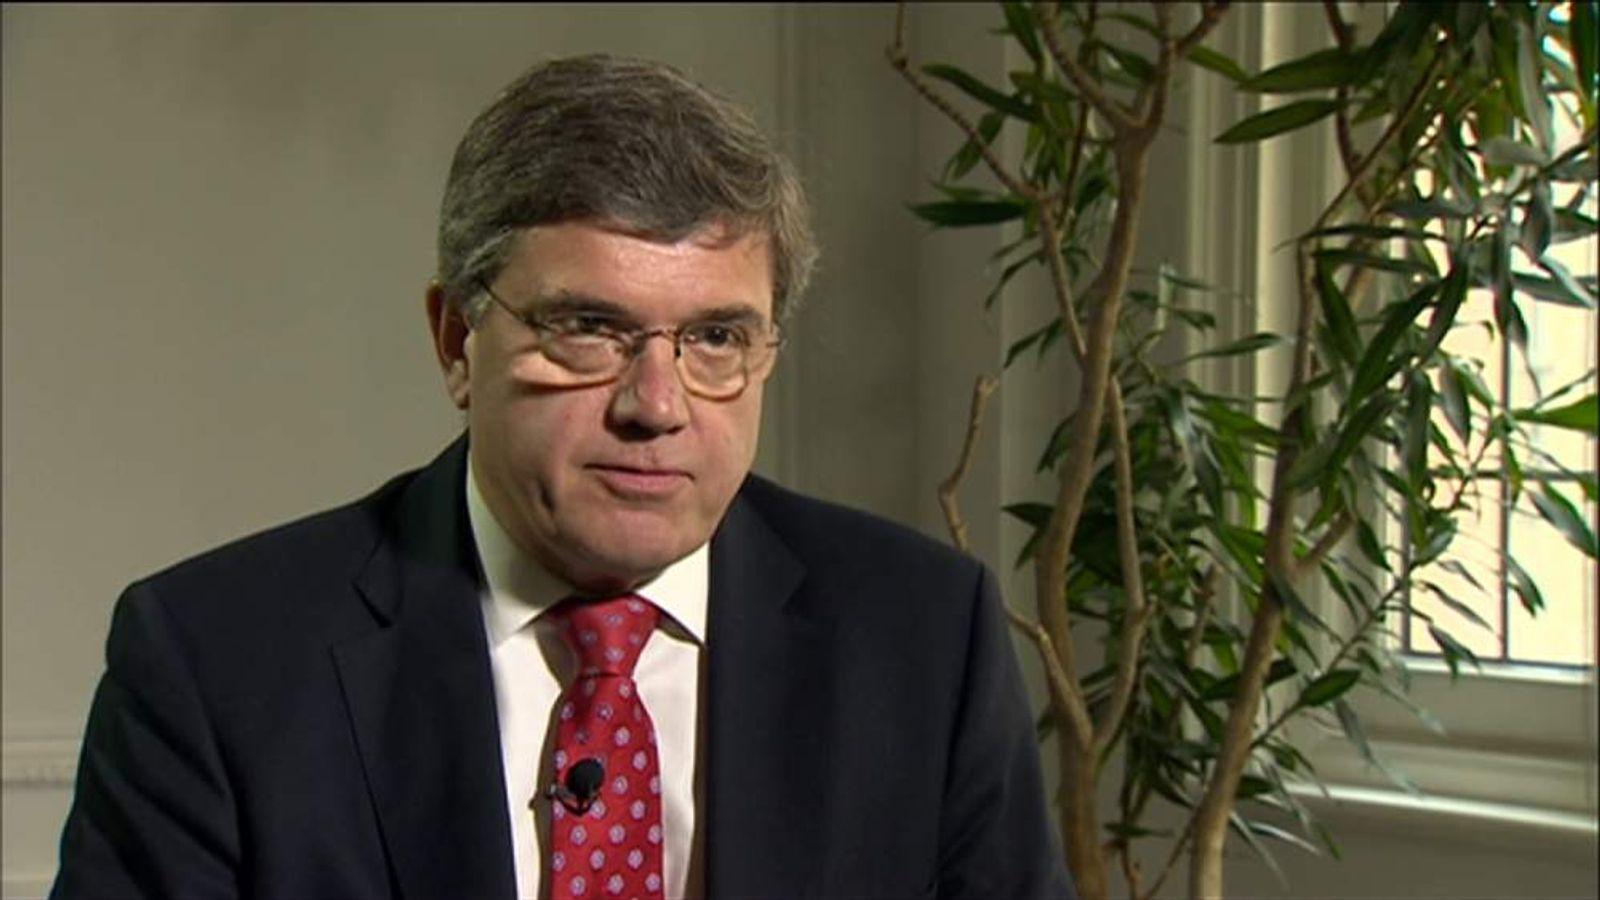 Peter Clarke, Inquiry Leader